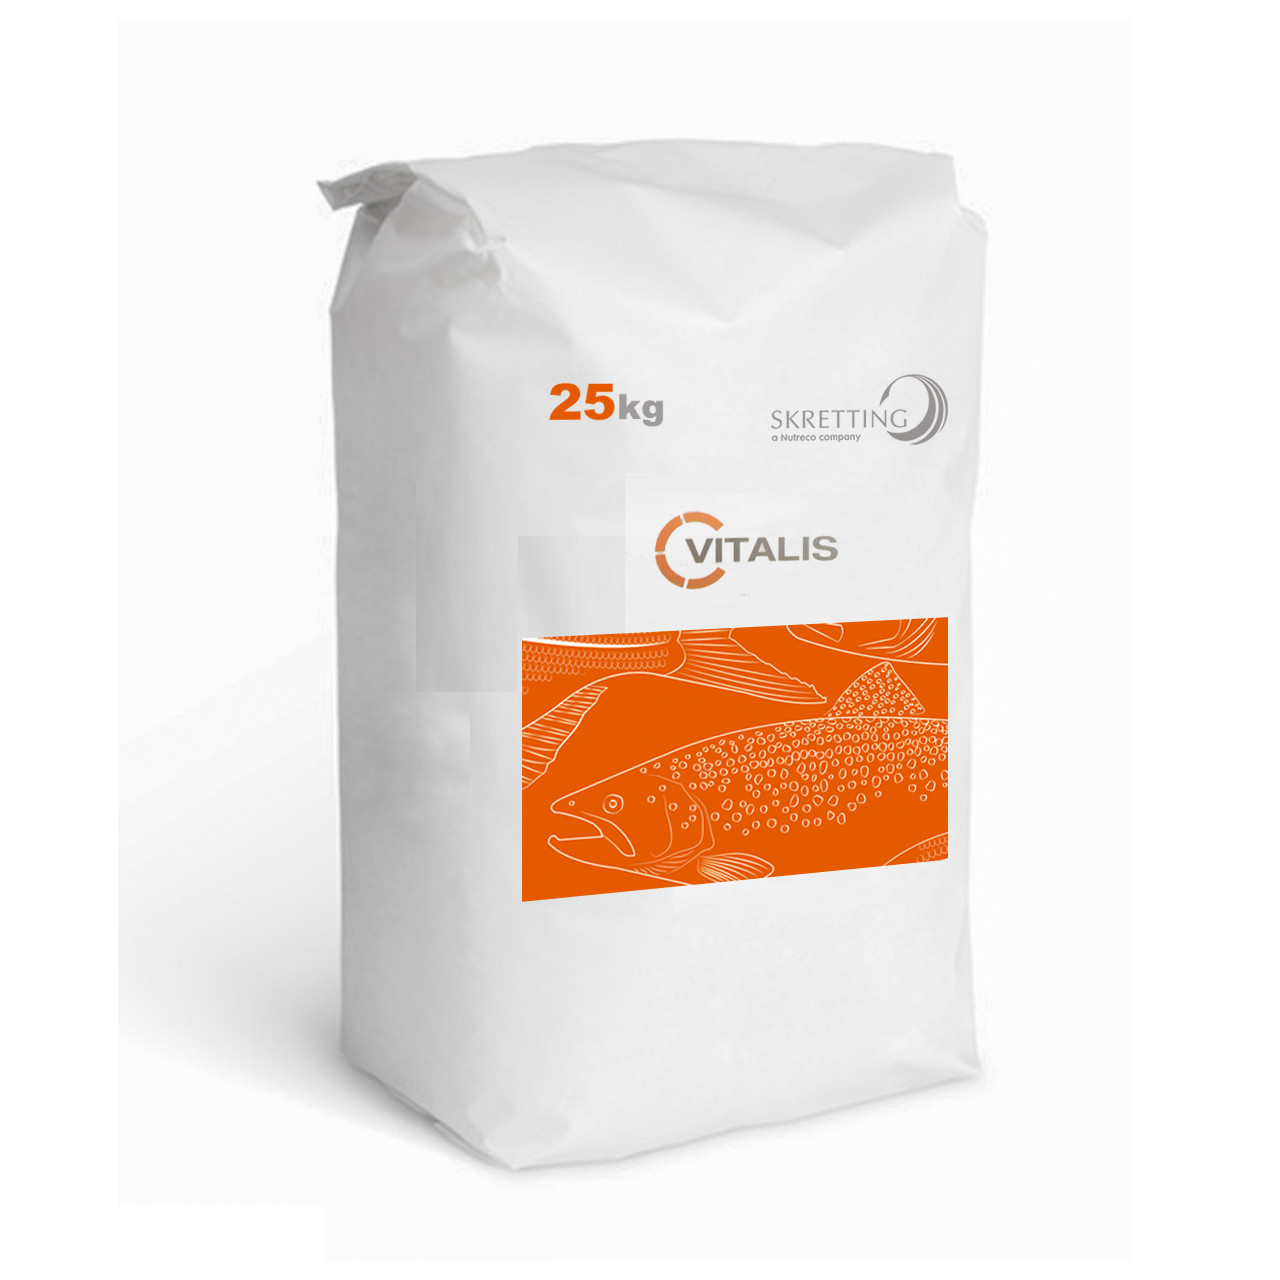 Alimento Skretting para Reproductores Marinos Vitalis REPRO de 9 mm